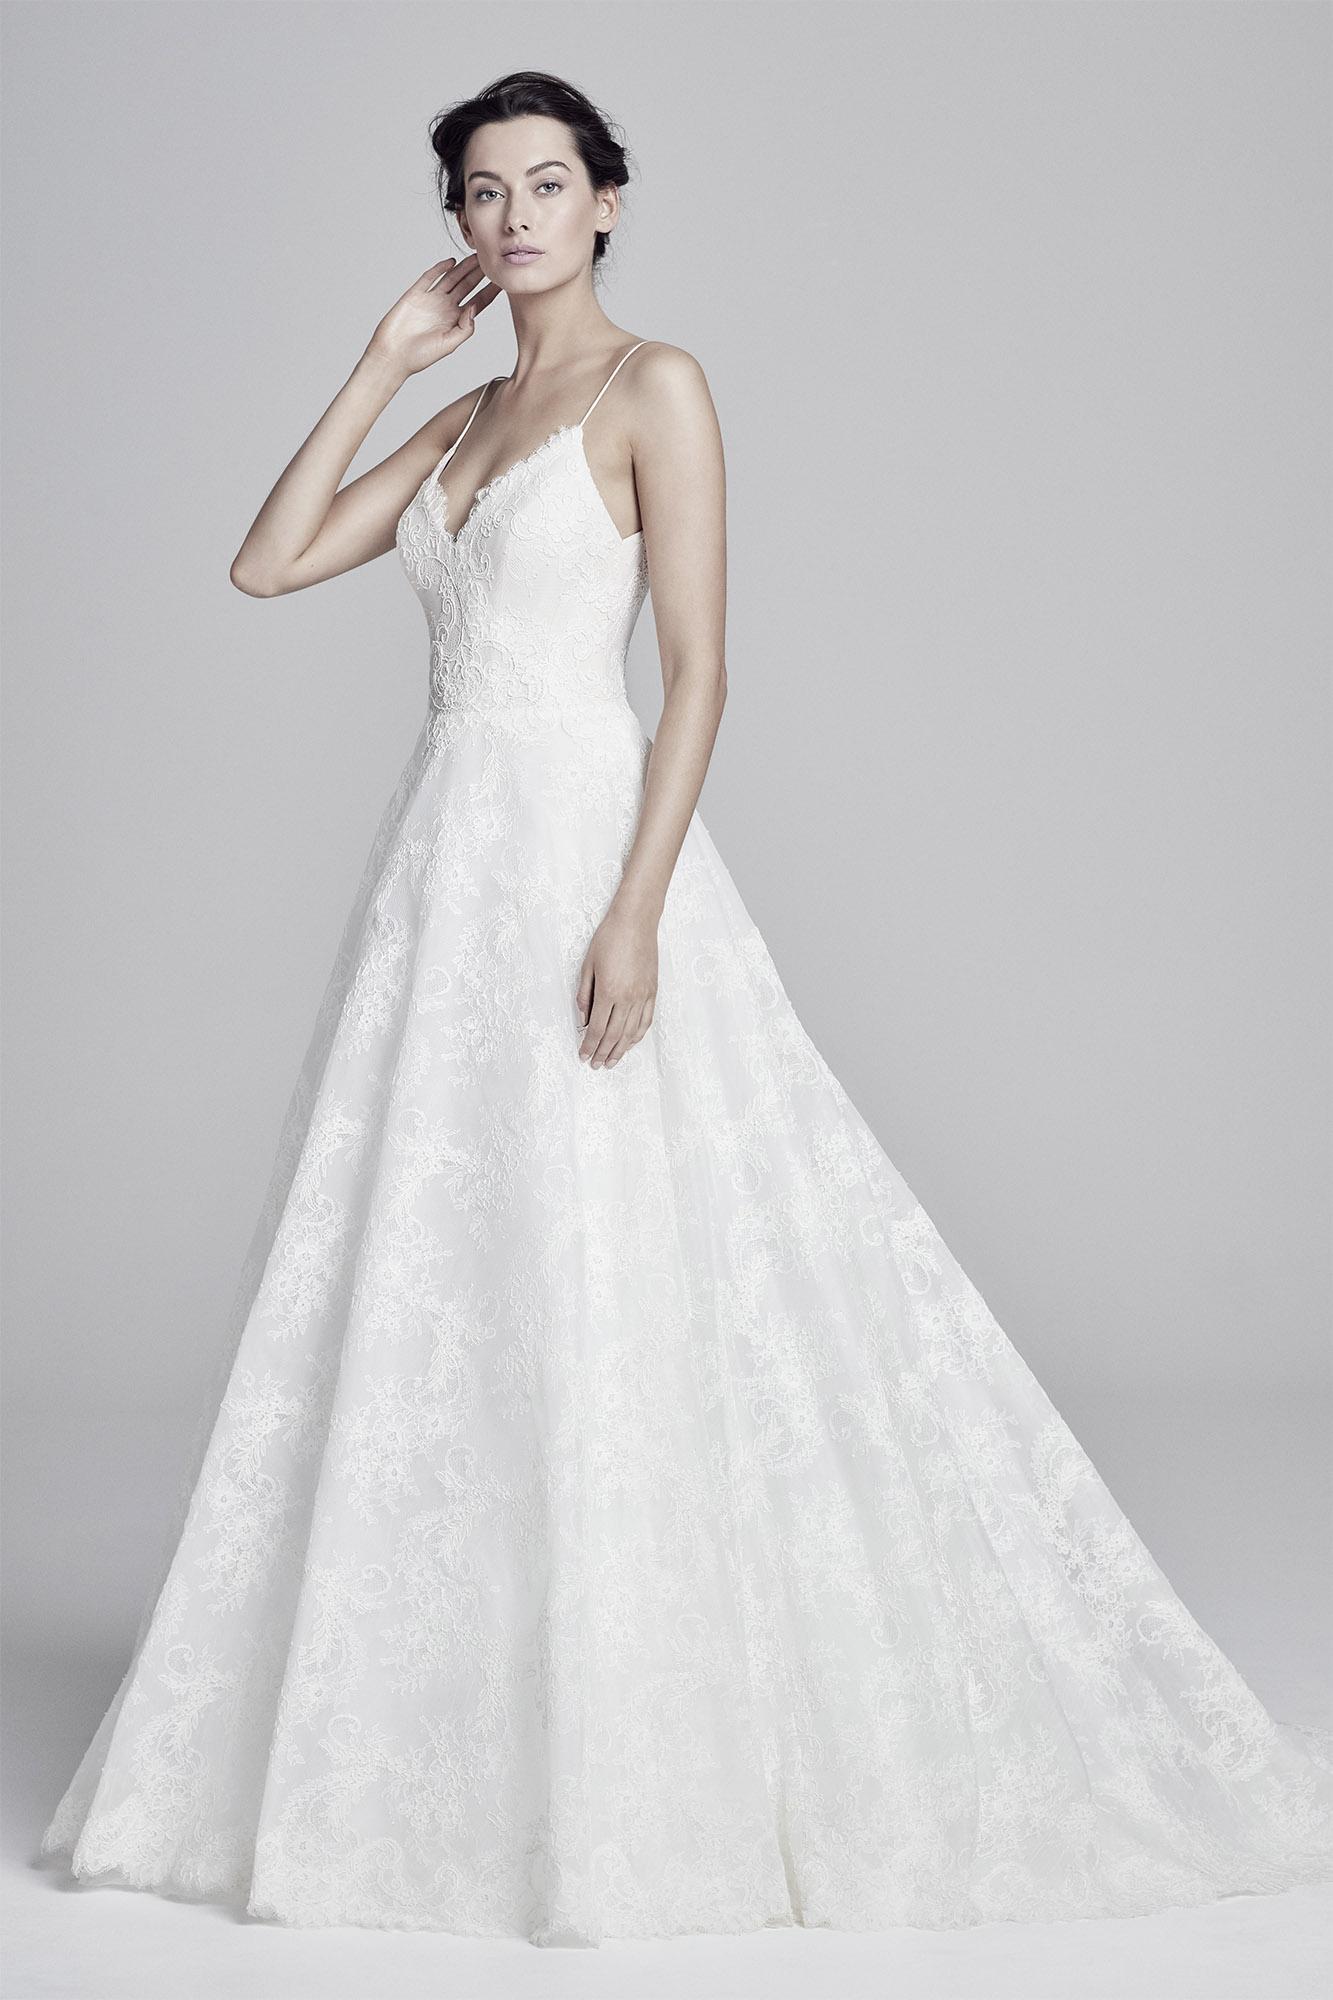 harlow-lookbook-collection2019-weddingdressesuk-designerSuzanneNeville.jpg